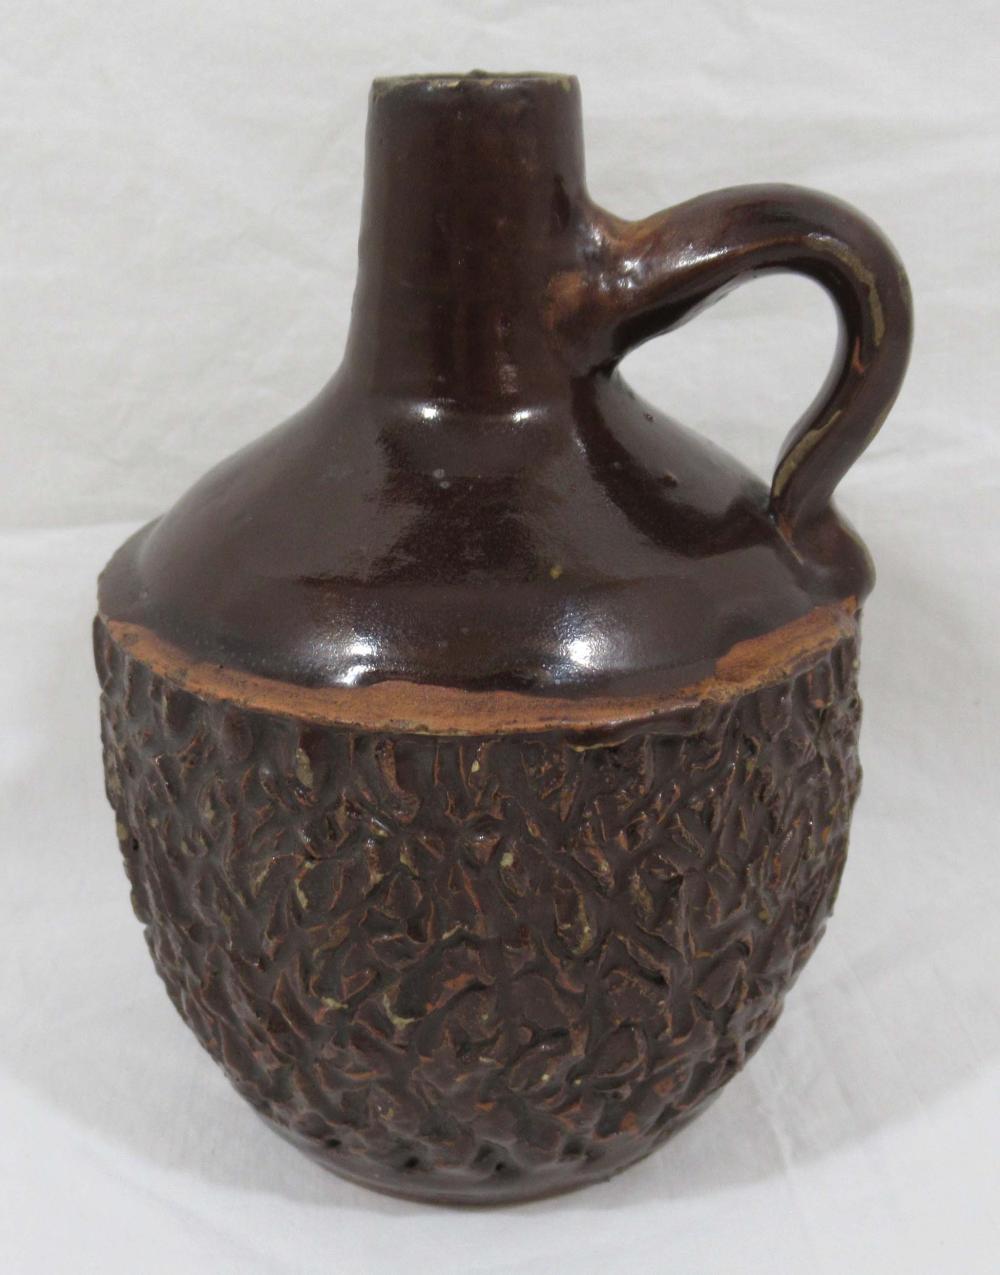 Evans Pottery Syrup Jug